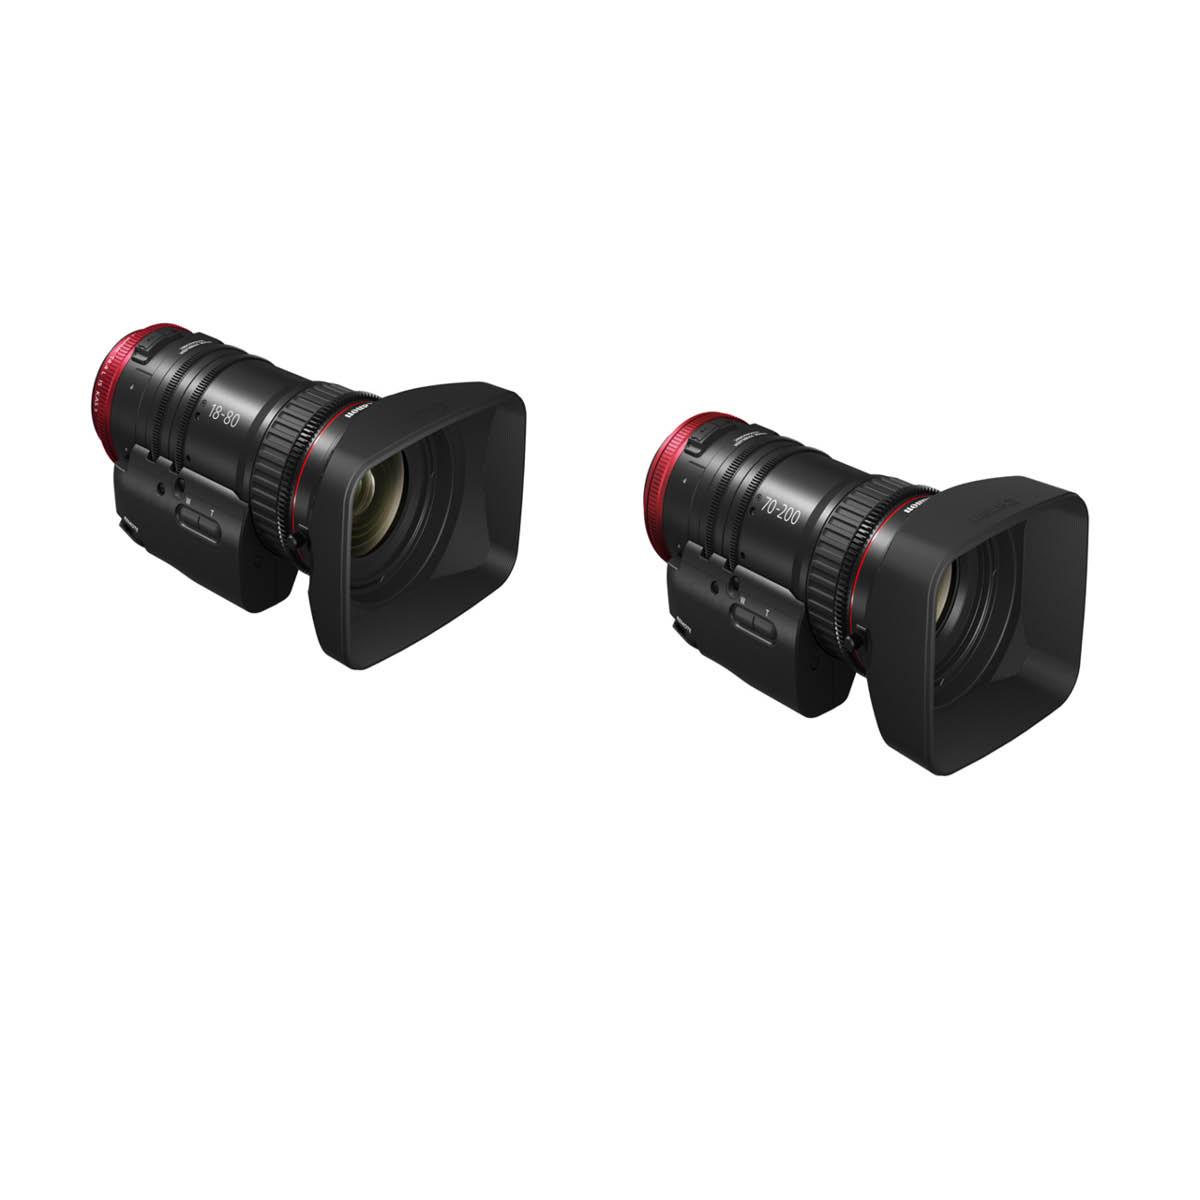 Canon 18-80 + 70-200 Cine Servo Kit